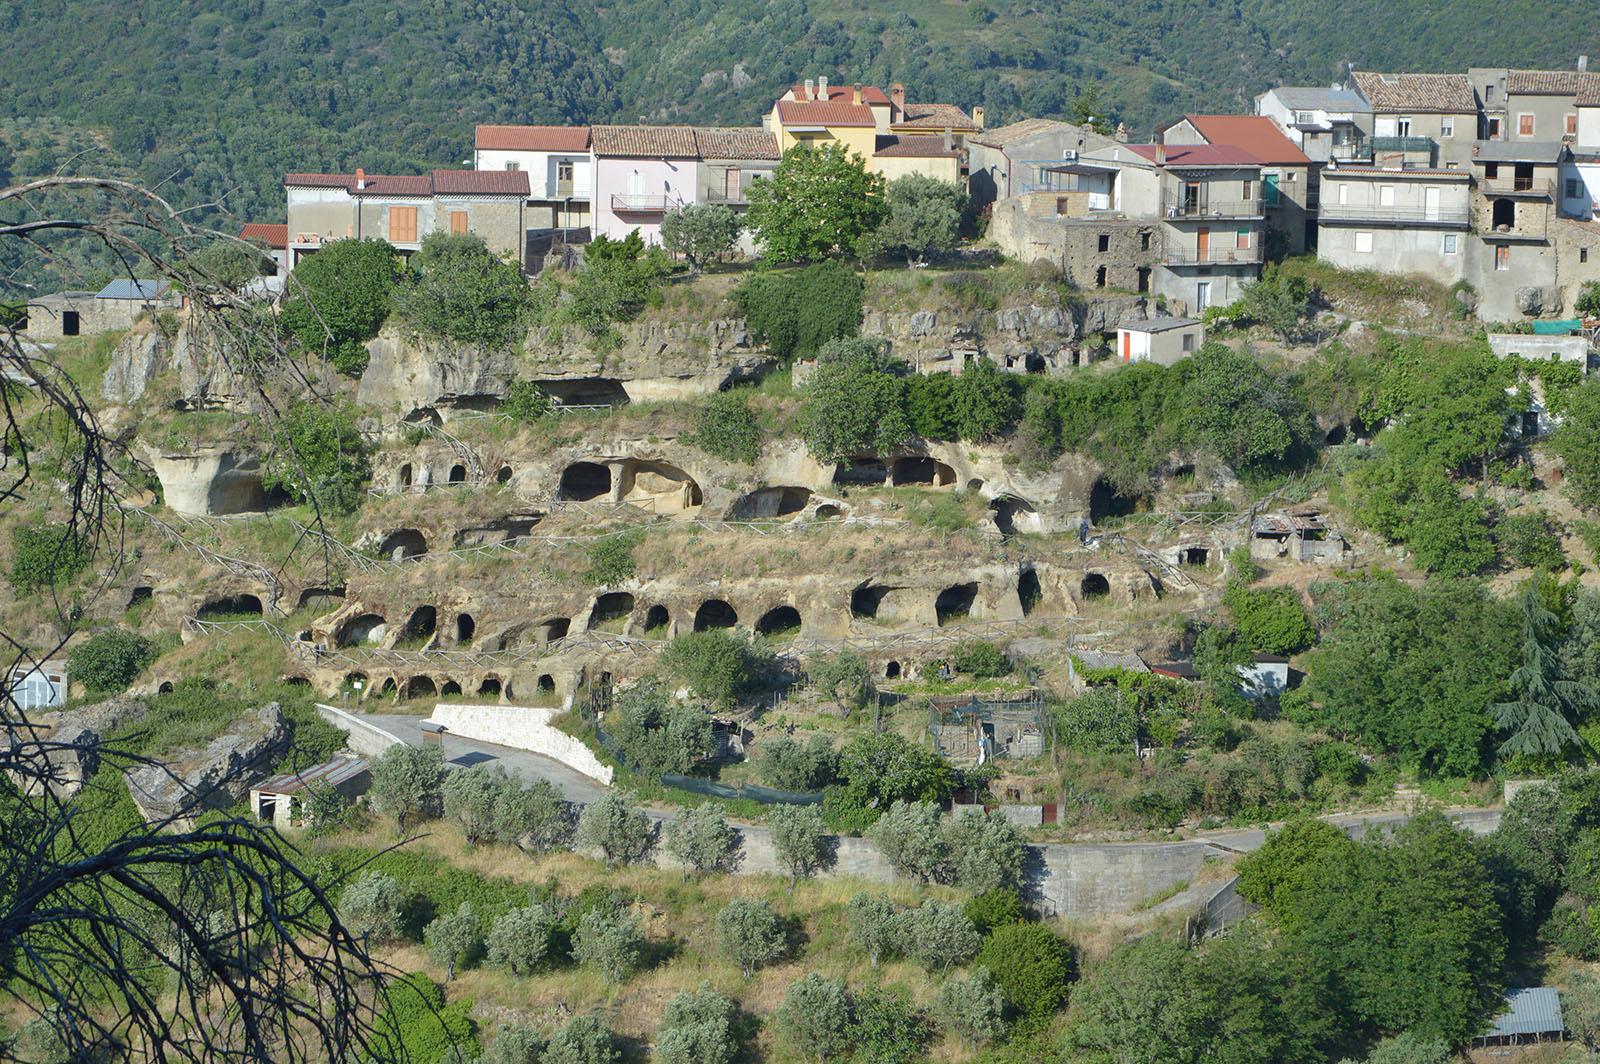 Grotte rupestri